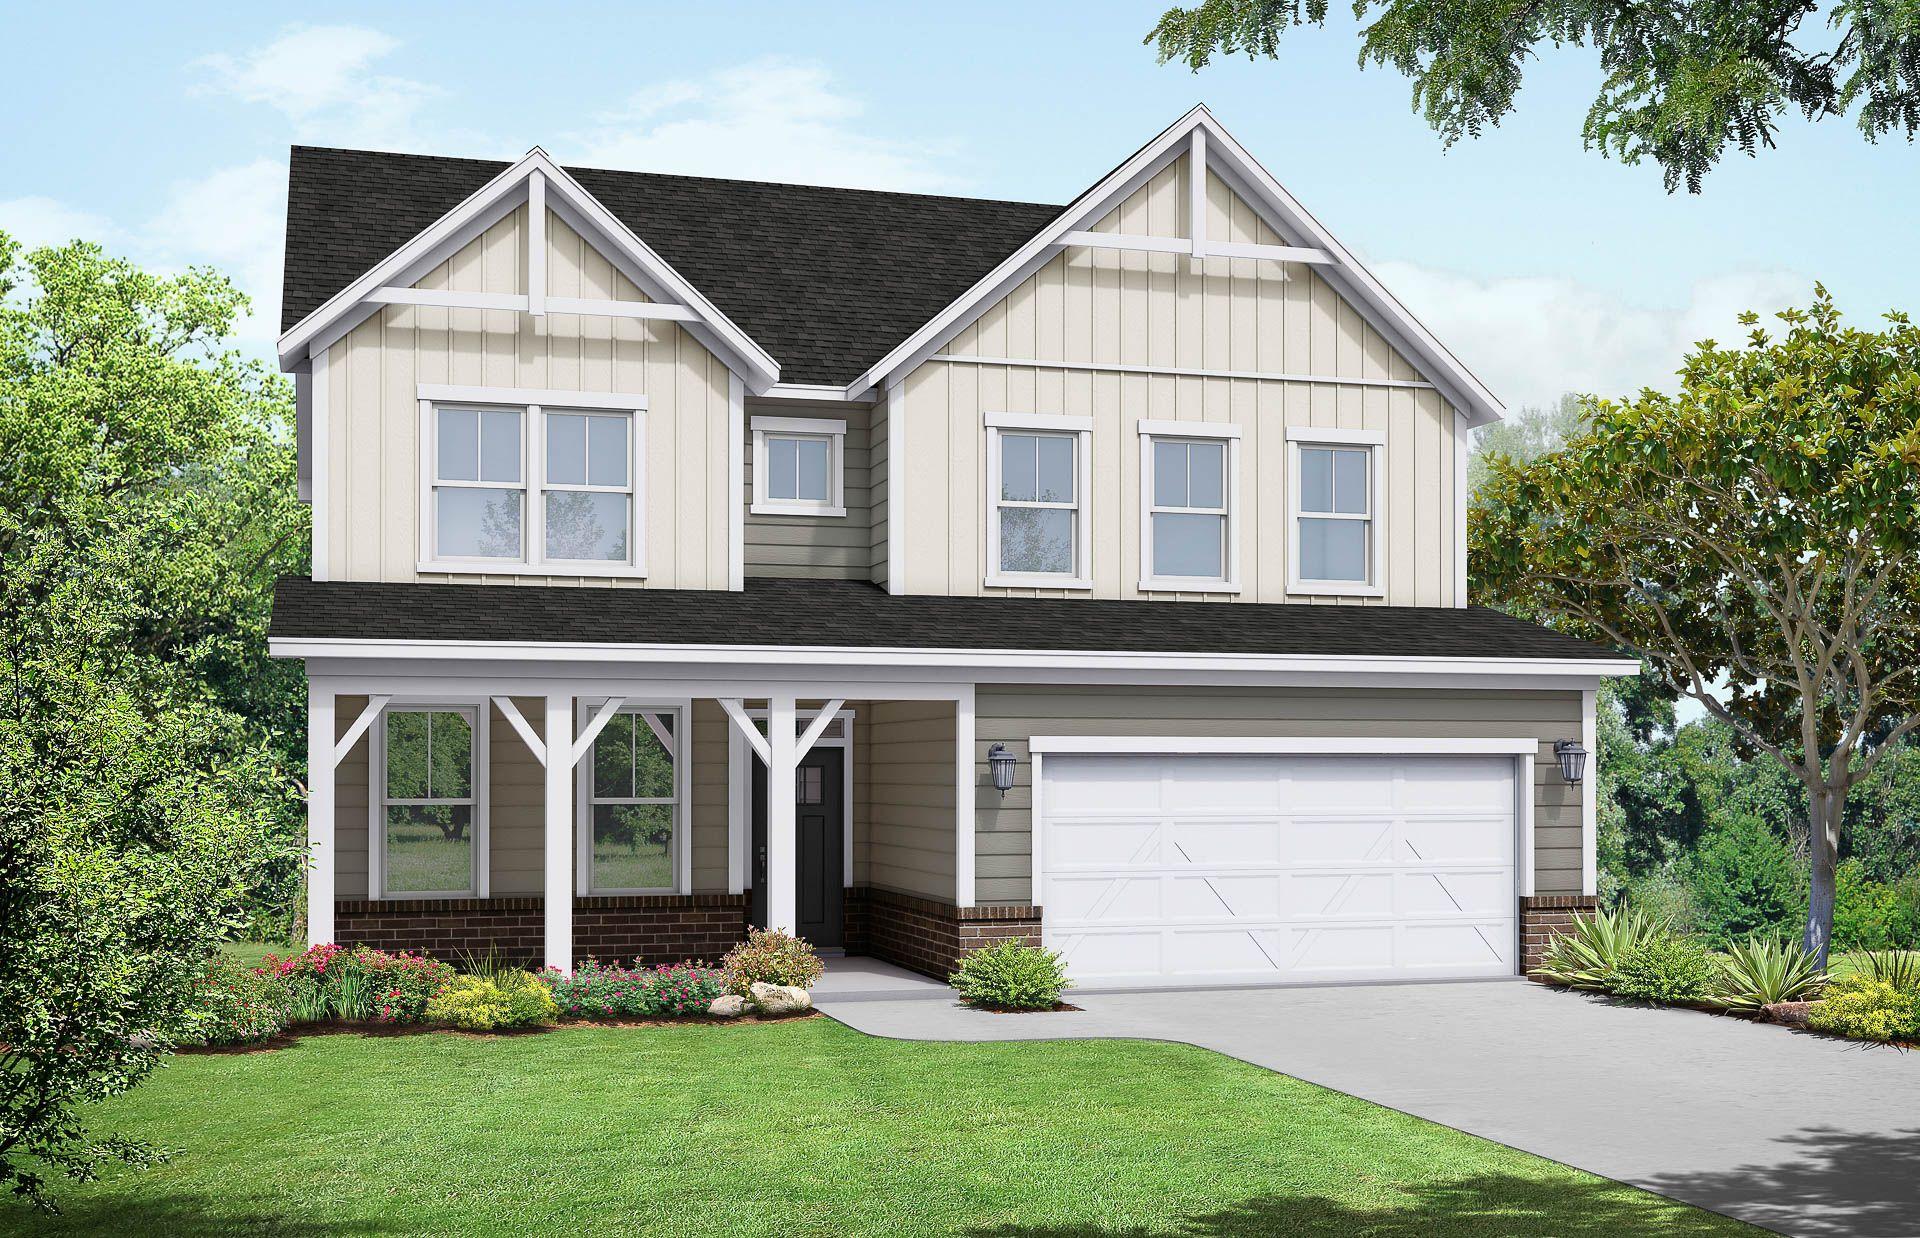 Davidson Homes The Willow B Floor Plan Exterior Rendering